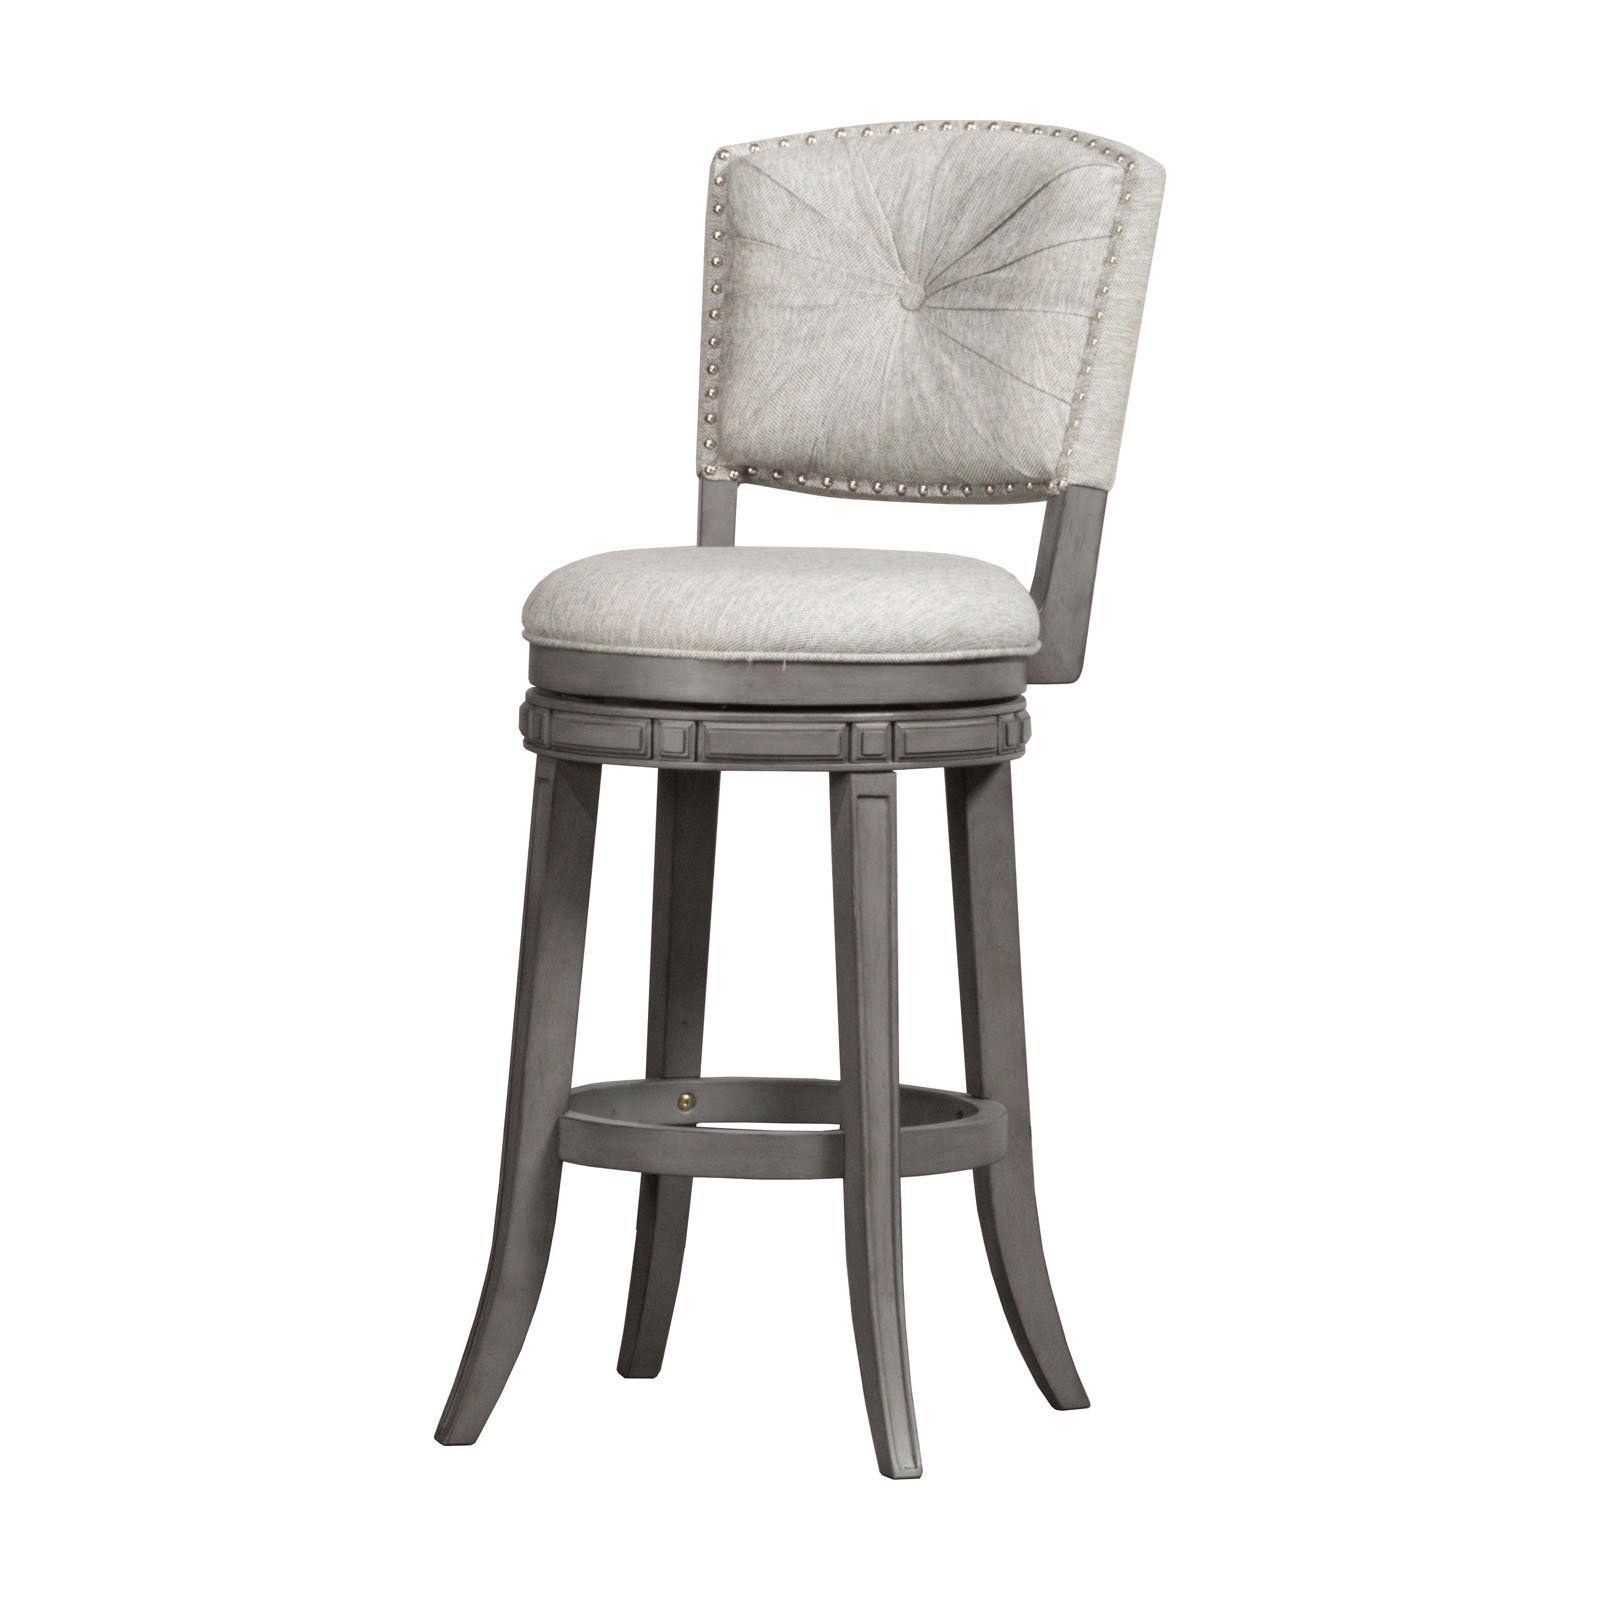 Hillsdale Furniture Santa Clara 30 In Swivel Bar Stool Swivel Counter Stools Bar Stools Hillsdale Furniture